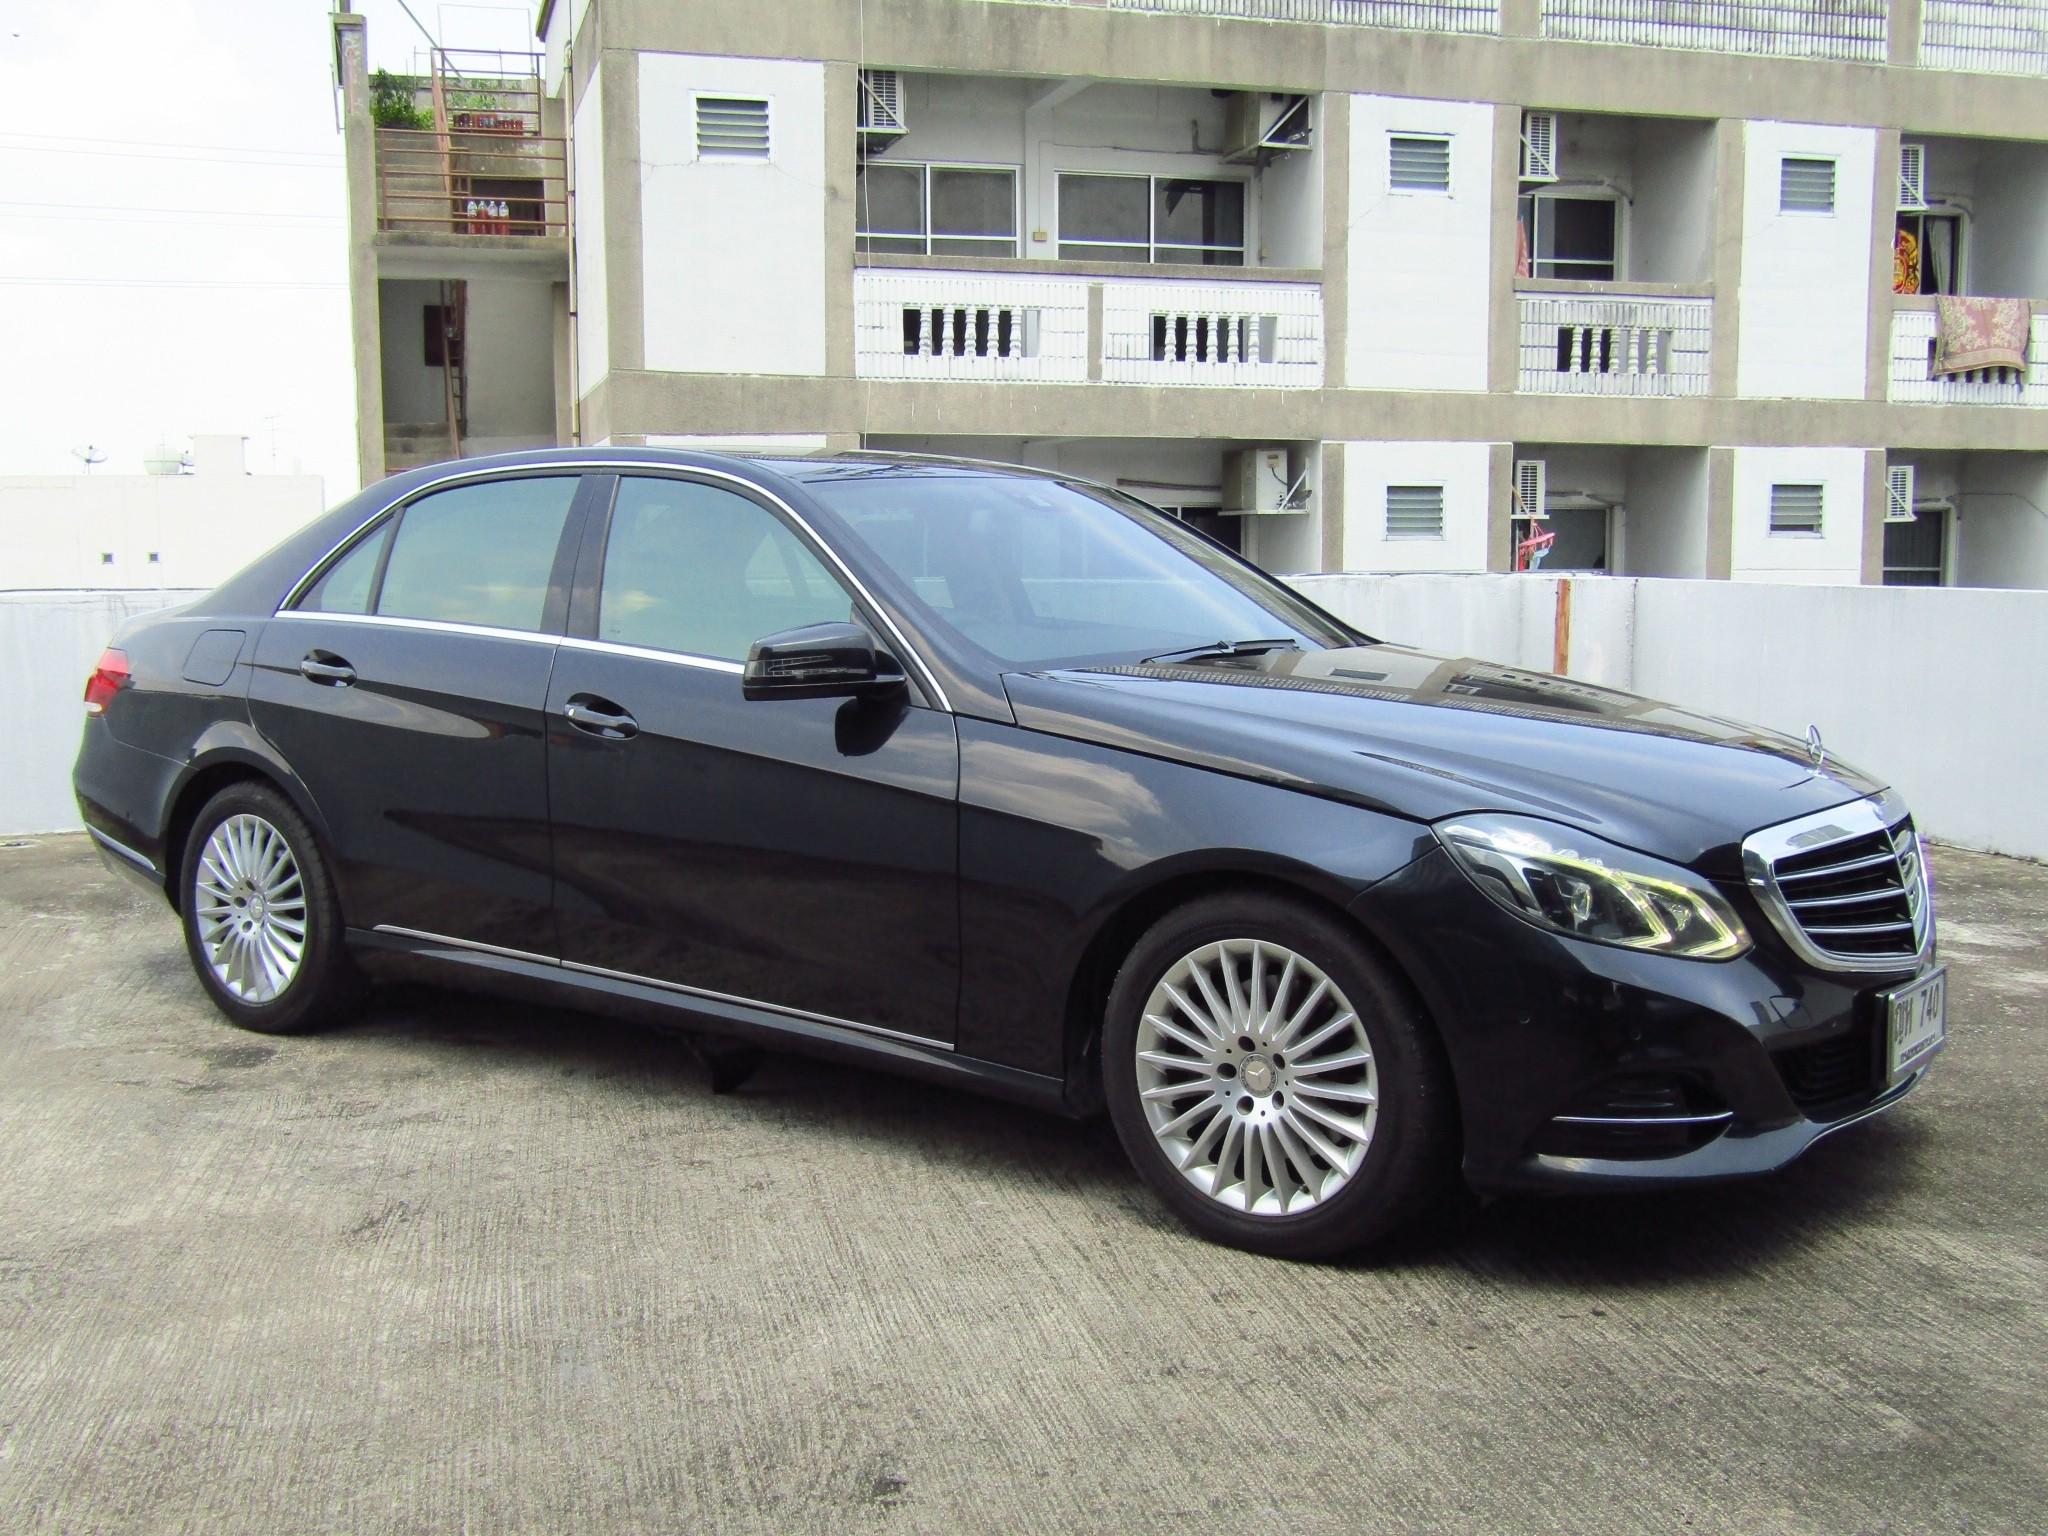 Mercedes-Benz (140,xxx) E300  BlueTEC HYBRID EXECUTIVE FACELIFT (ราคาไม่รวมทะเบียน) (ผ่อน 18,050 บาท / 60 งวด)